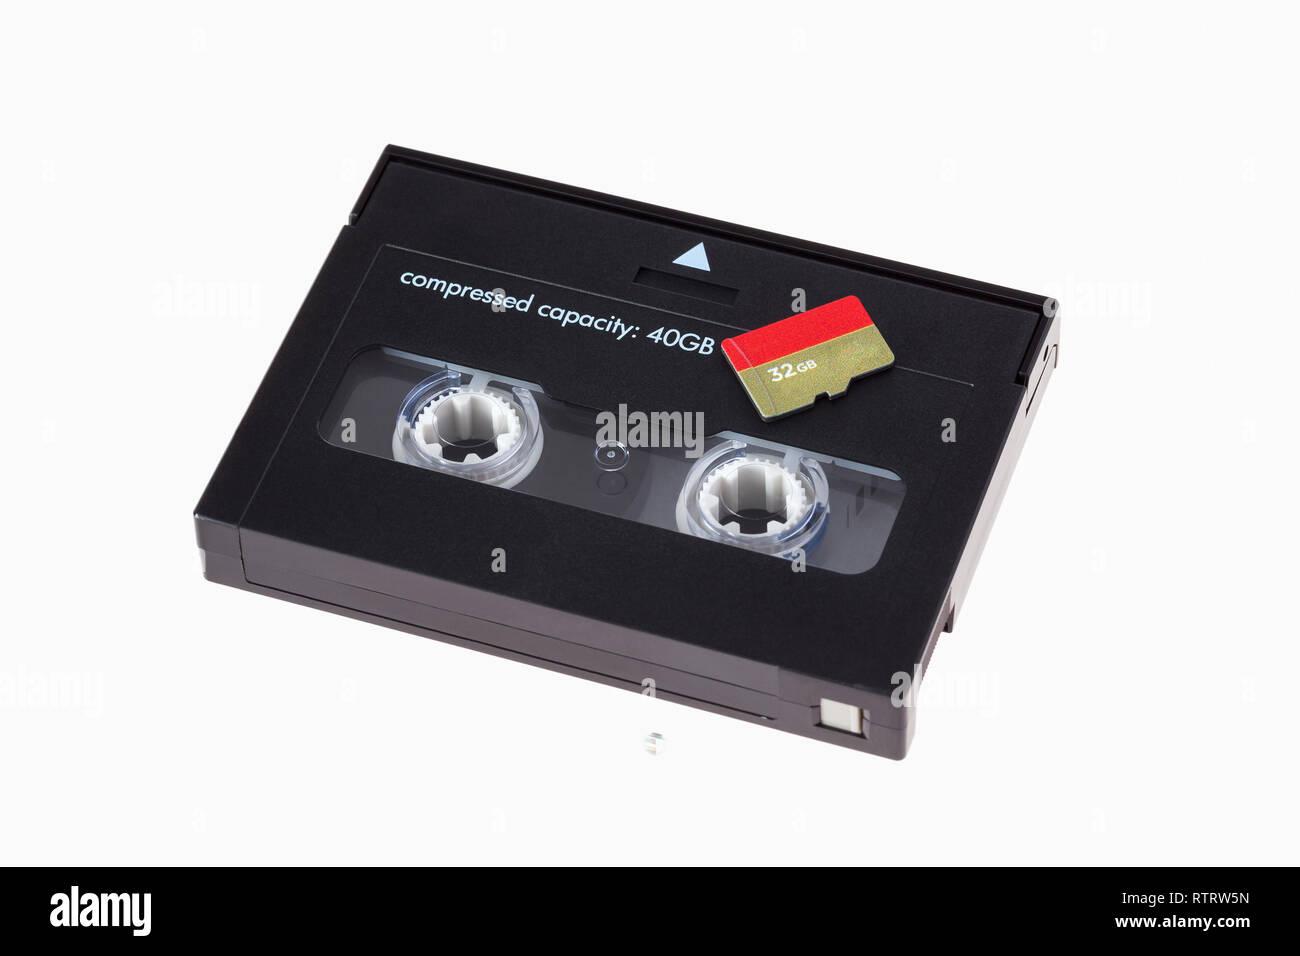 Micro Cassette Stock Photos & Micro Cassette Stock Images - Alamy